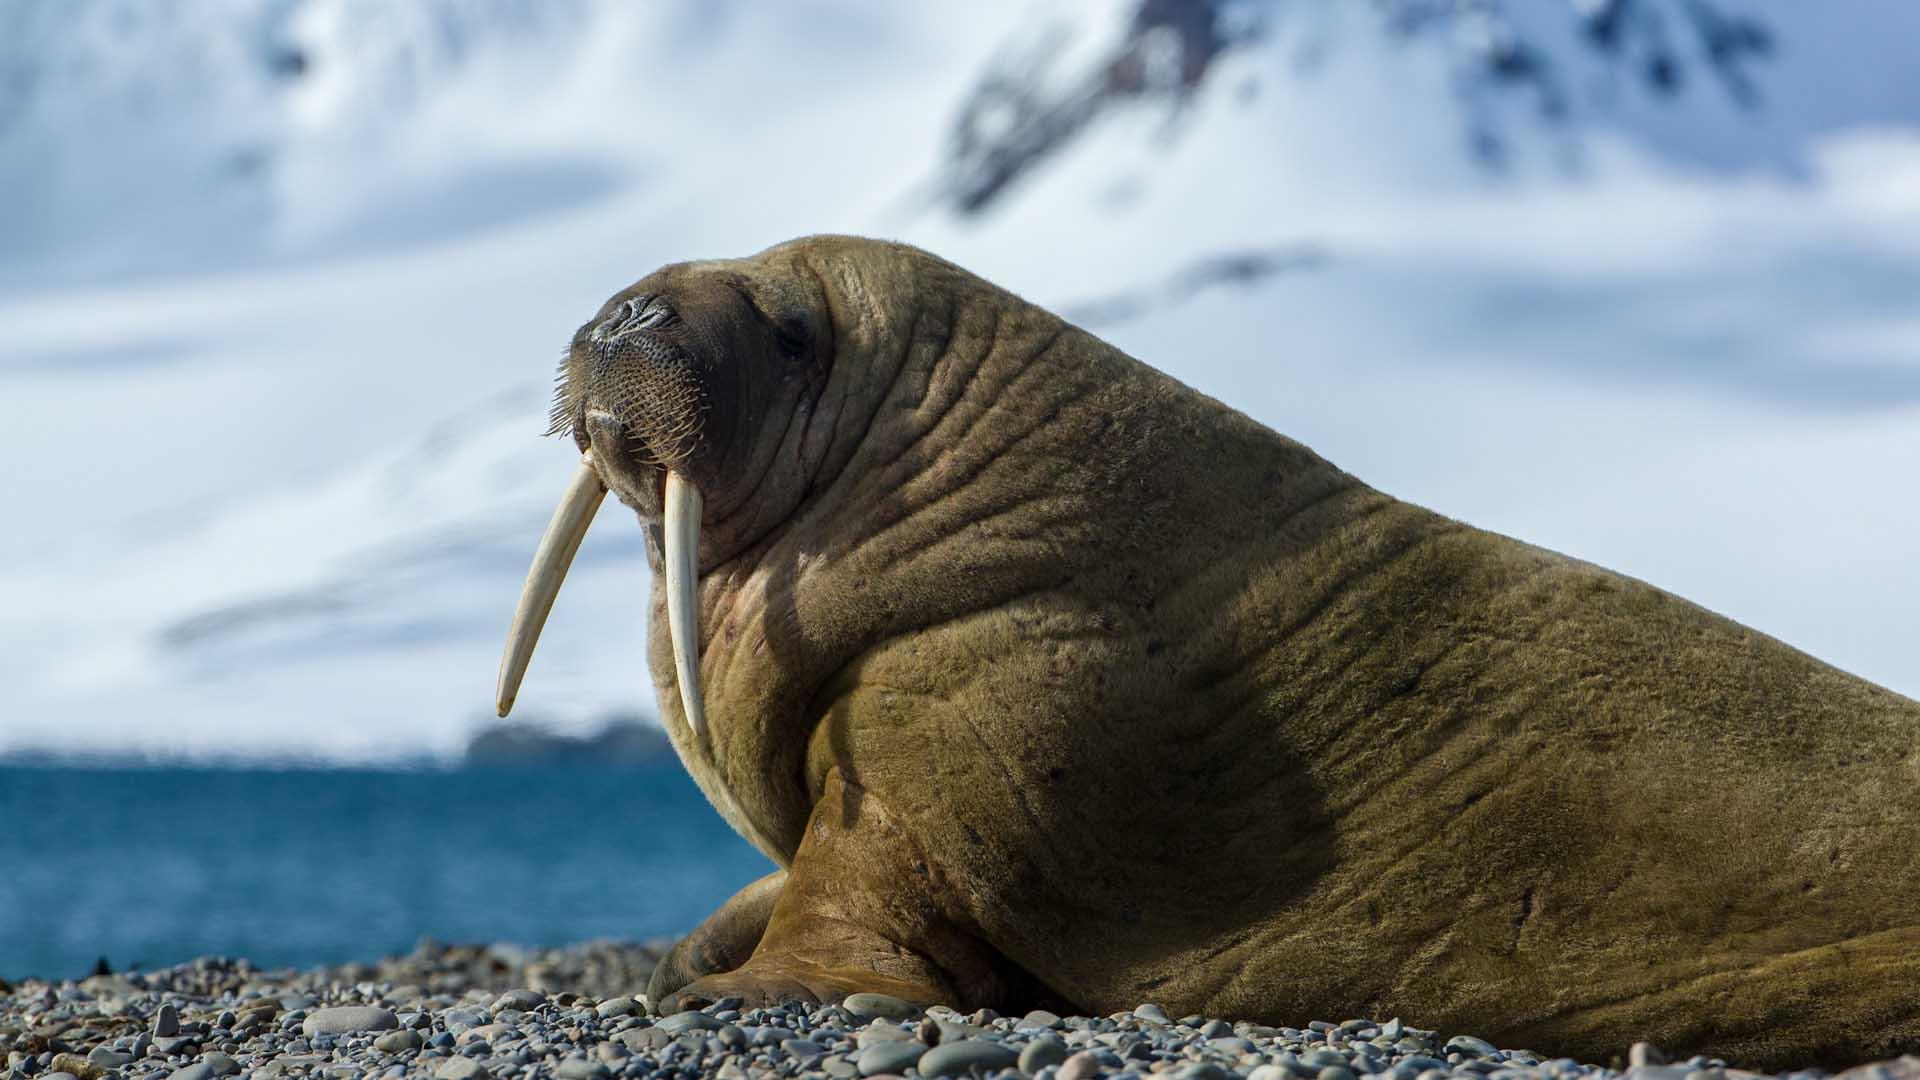 зачем откуда фото моржа в арктике когда она осознаёт